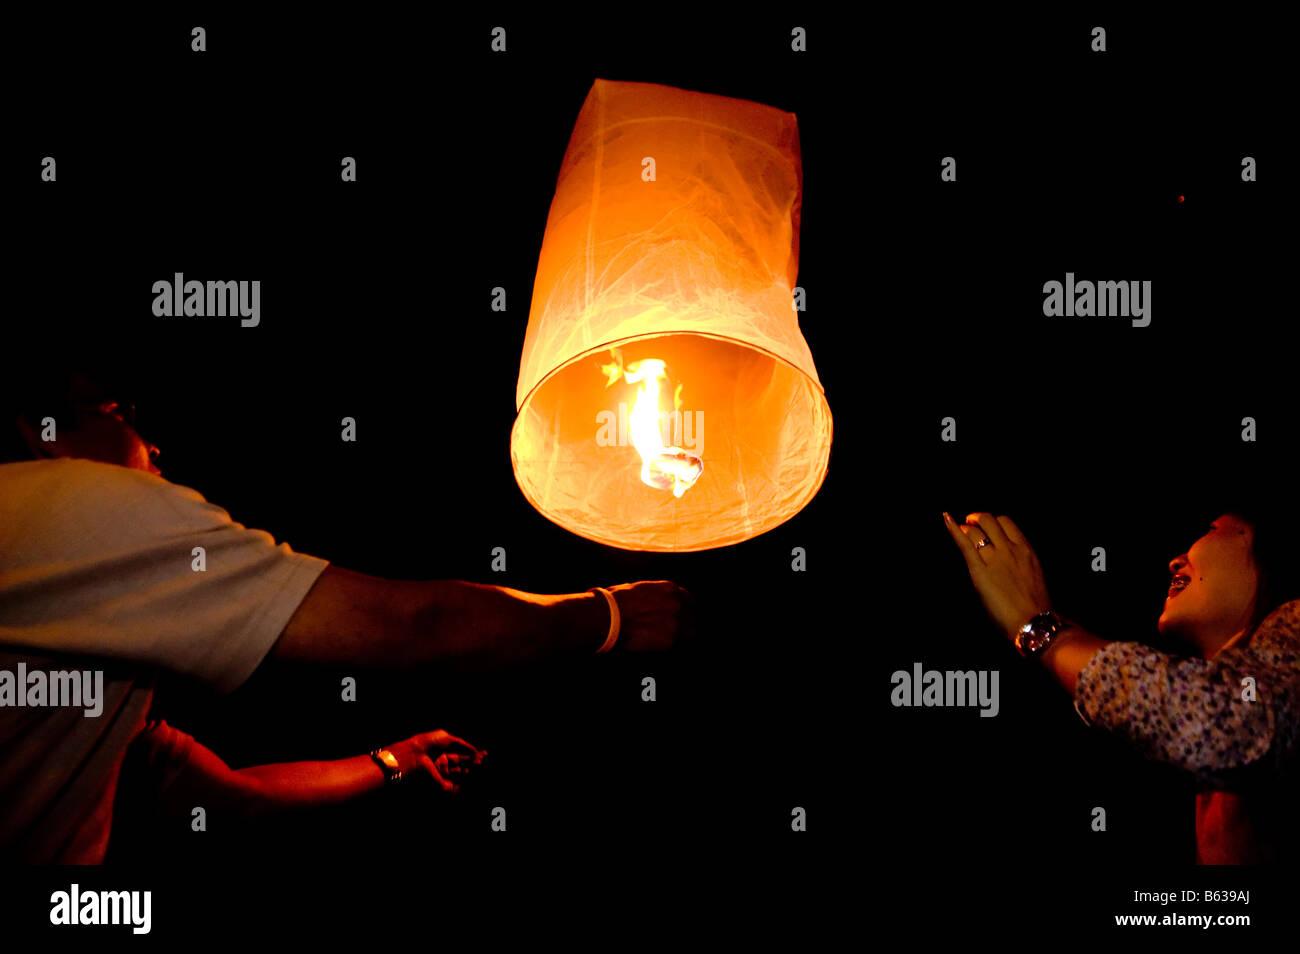 Loi Kratong Festival In Chiang Mai Thailand A Couple Light A Komloi Stock Photo Alamy